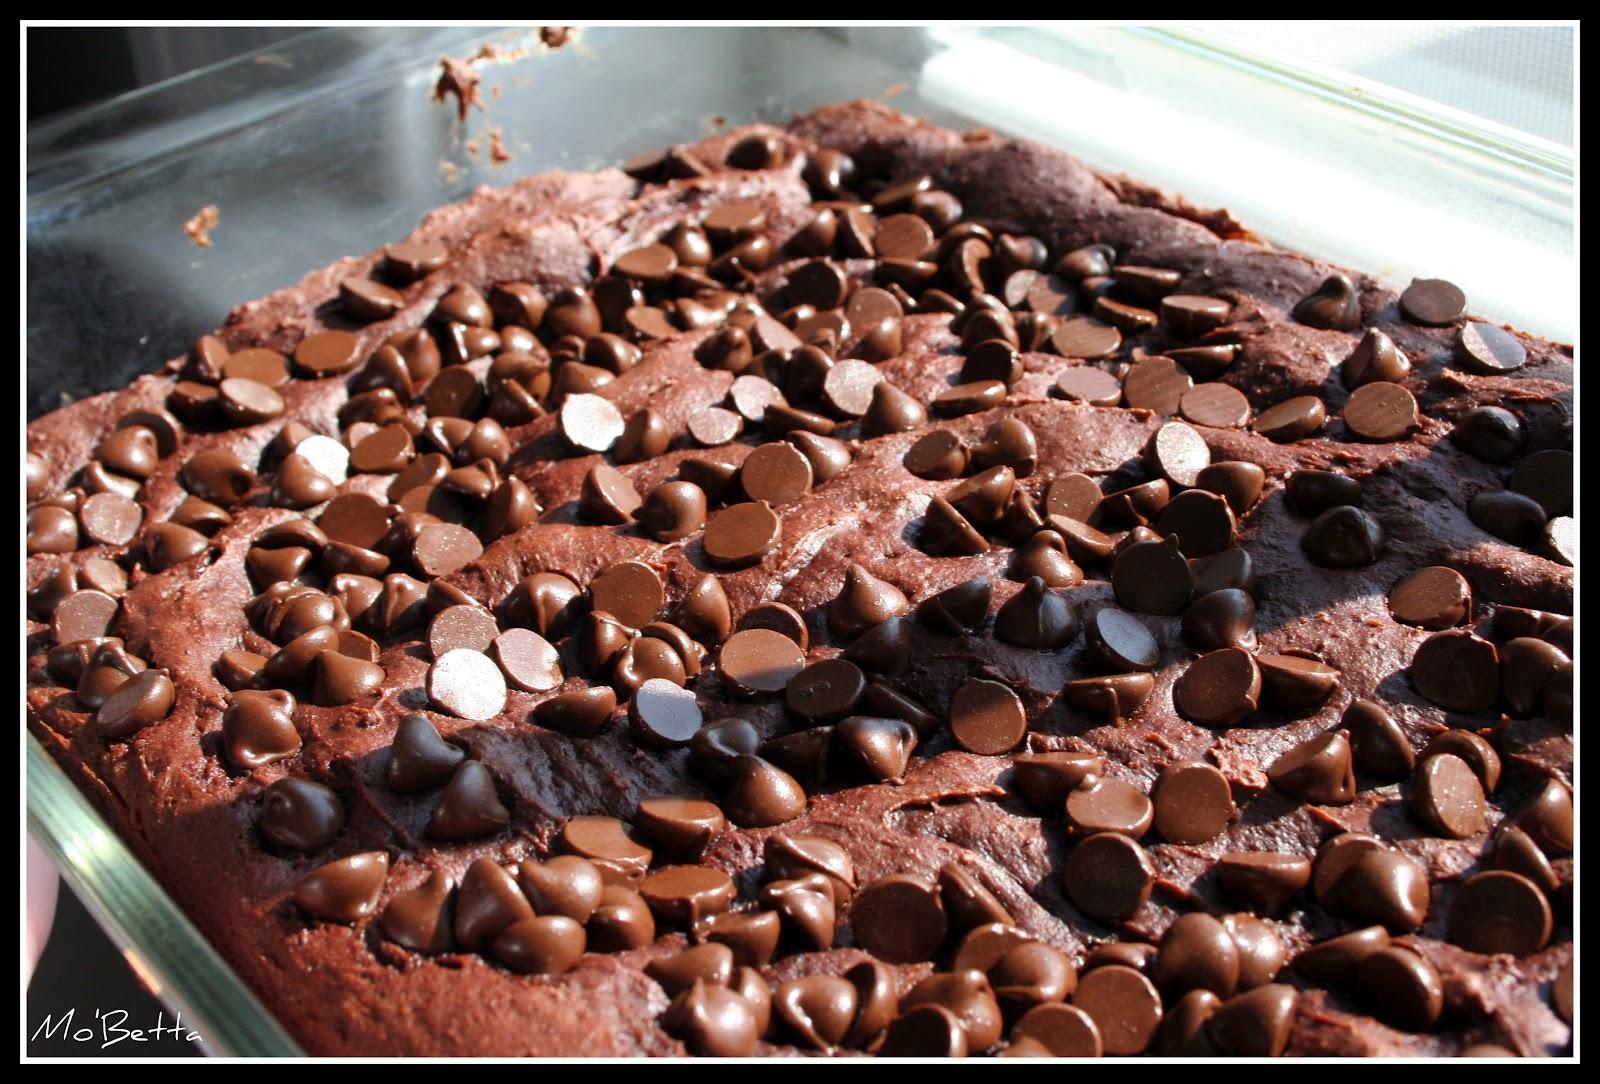 Chocolate Pudding Dump Cake - 4 ingredients! - Makin' it Mo'Betta